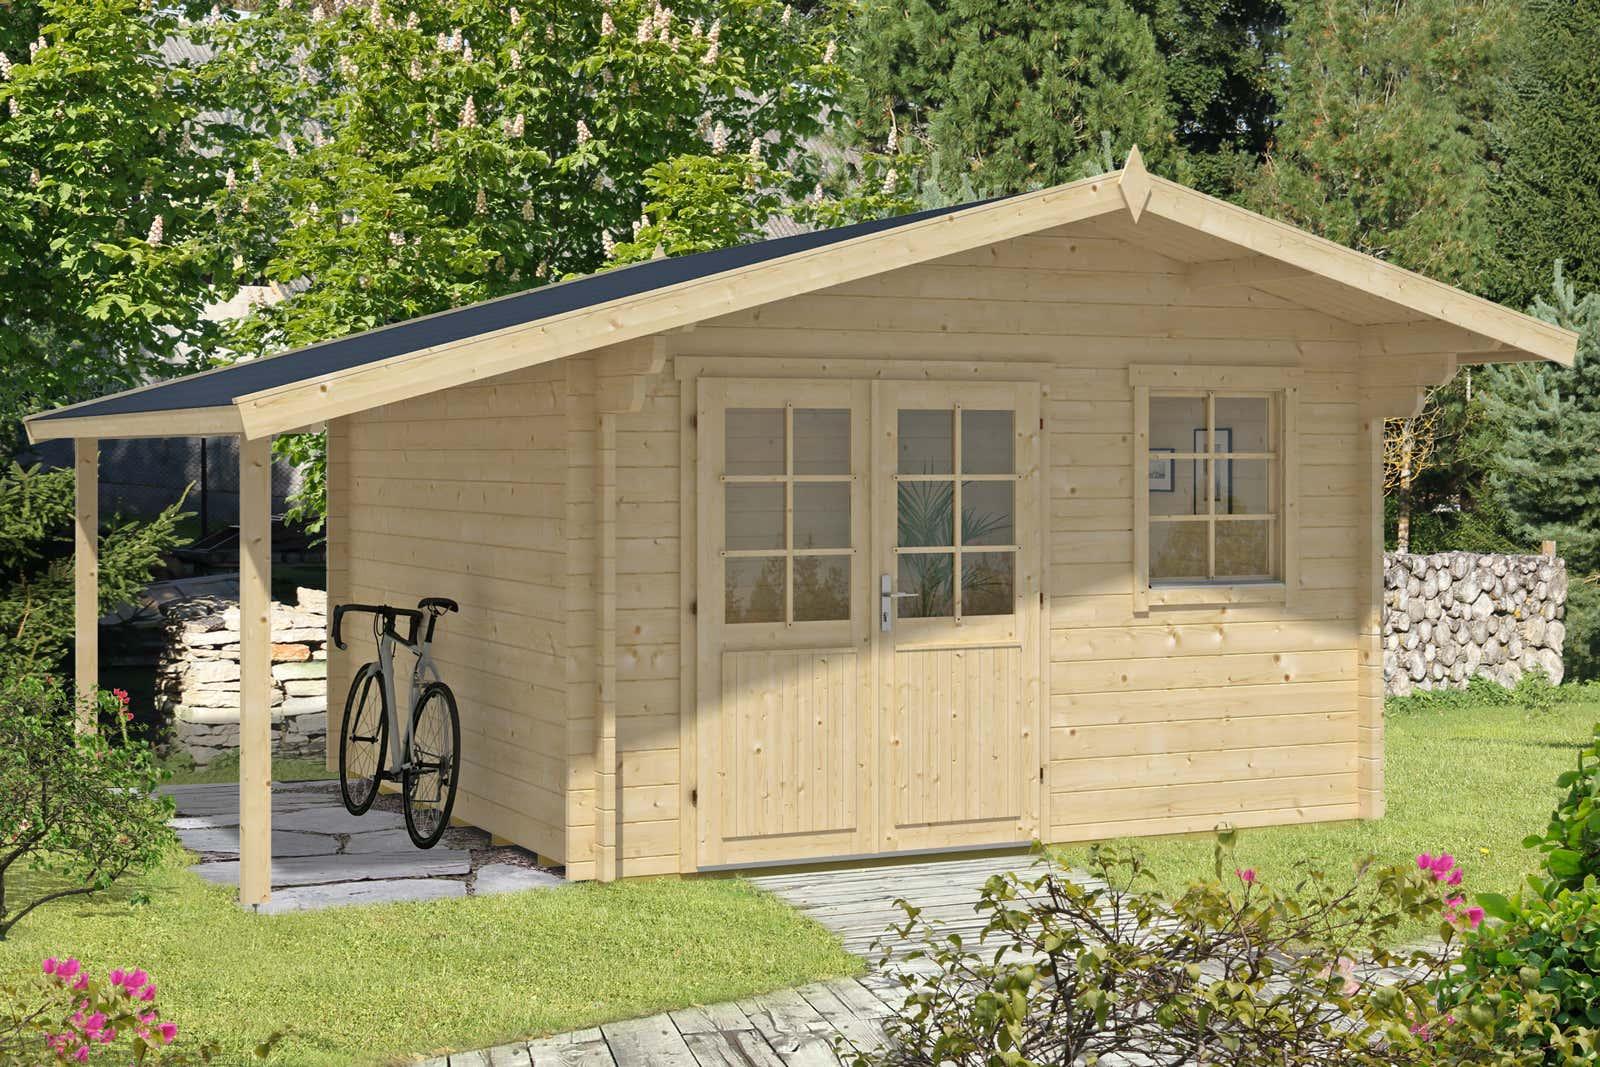 gartenhaus modell franco 44 premium gartenhaus modell franco 44 premium a z gartenhaus gmbh. Black Bedroom Furniture Sets. Home Design Ideas